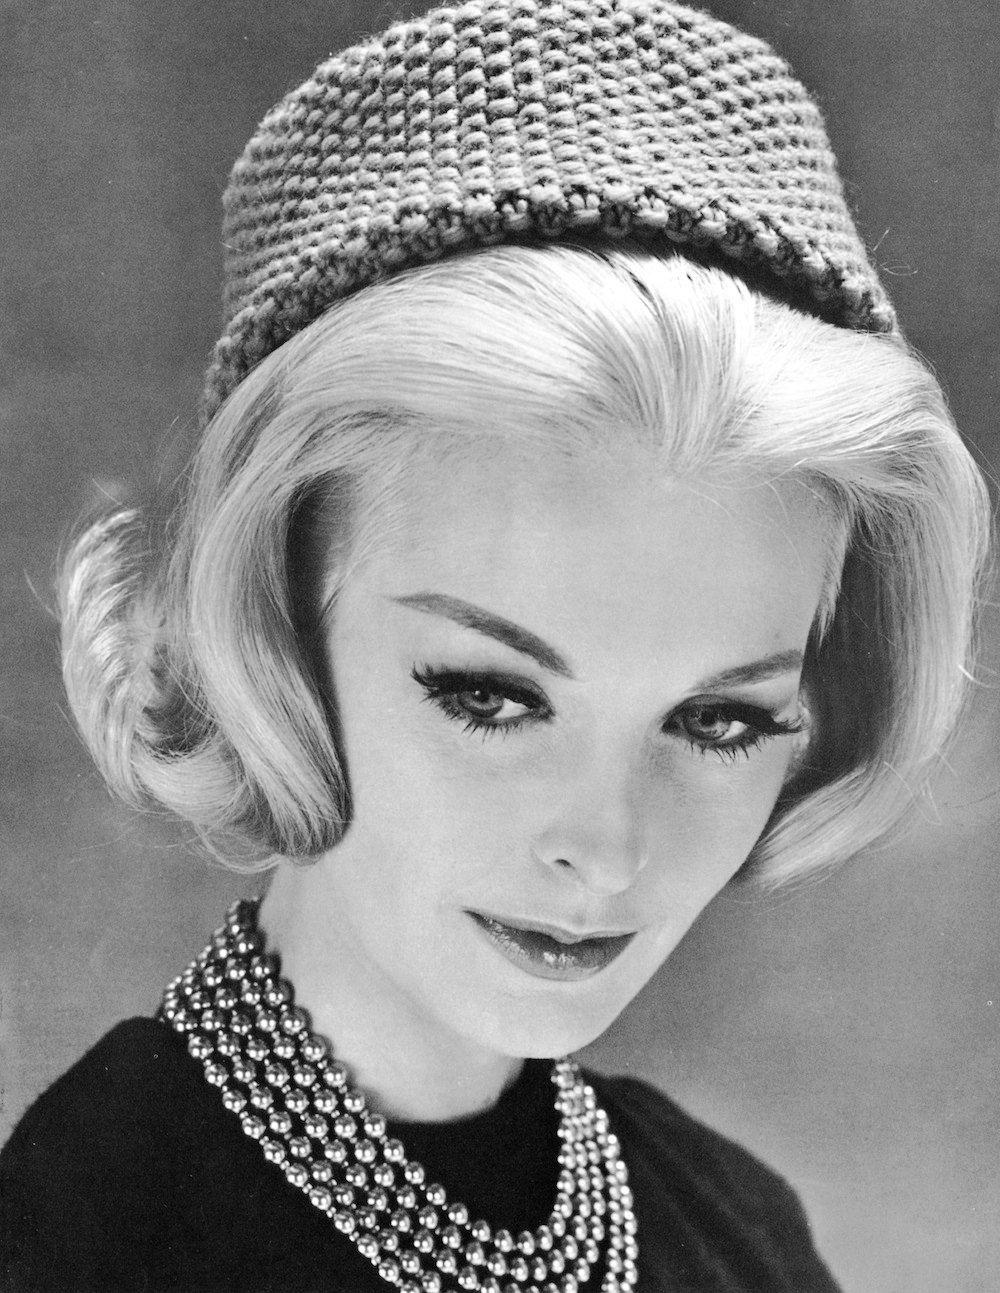 1960s Pill Box Hat Vintage Knitting Pattern PDF | Pill boxes, 1960s ...